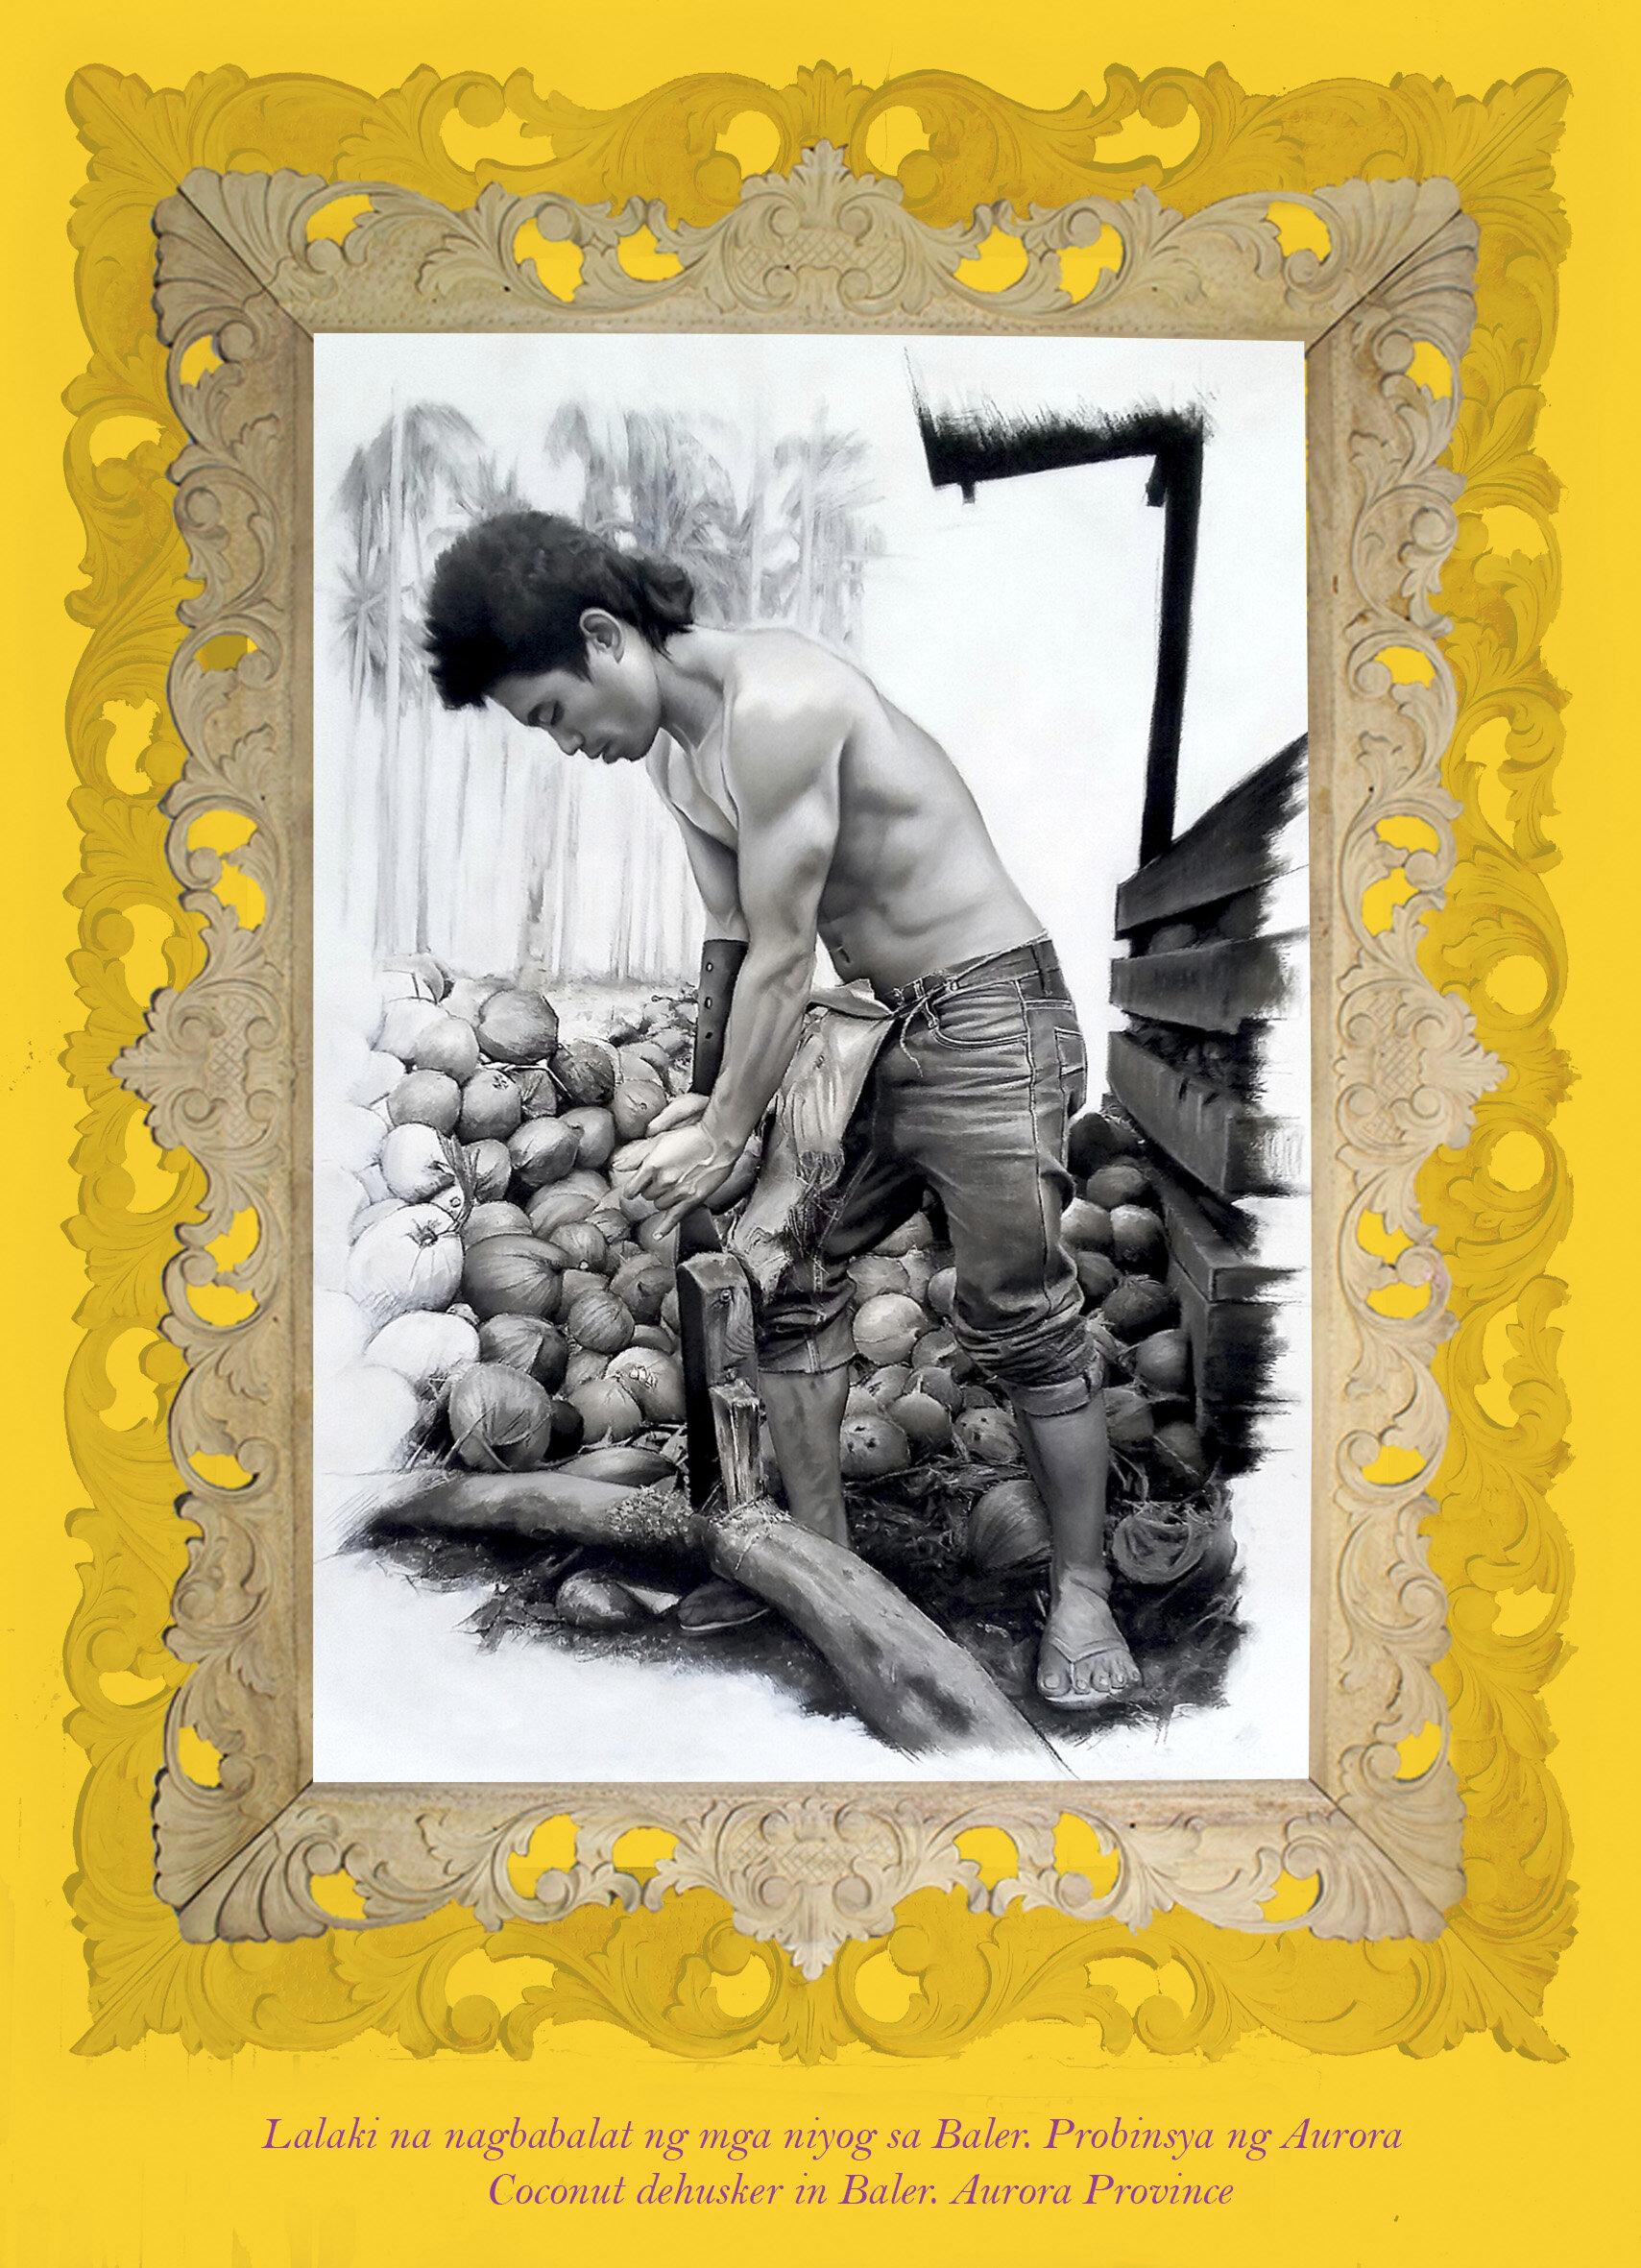 Coconut dehusker in Baler. Aurora Province. Artist Maria Mari Murga.jpg